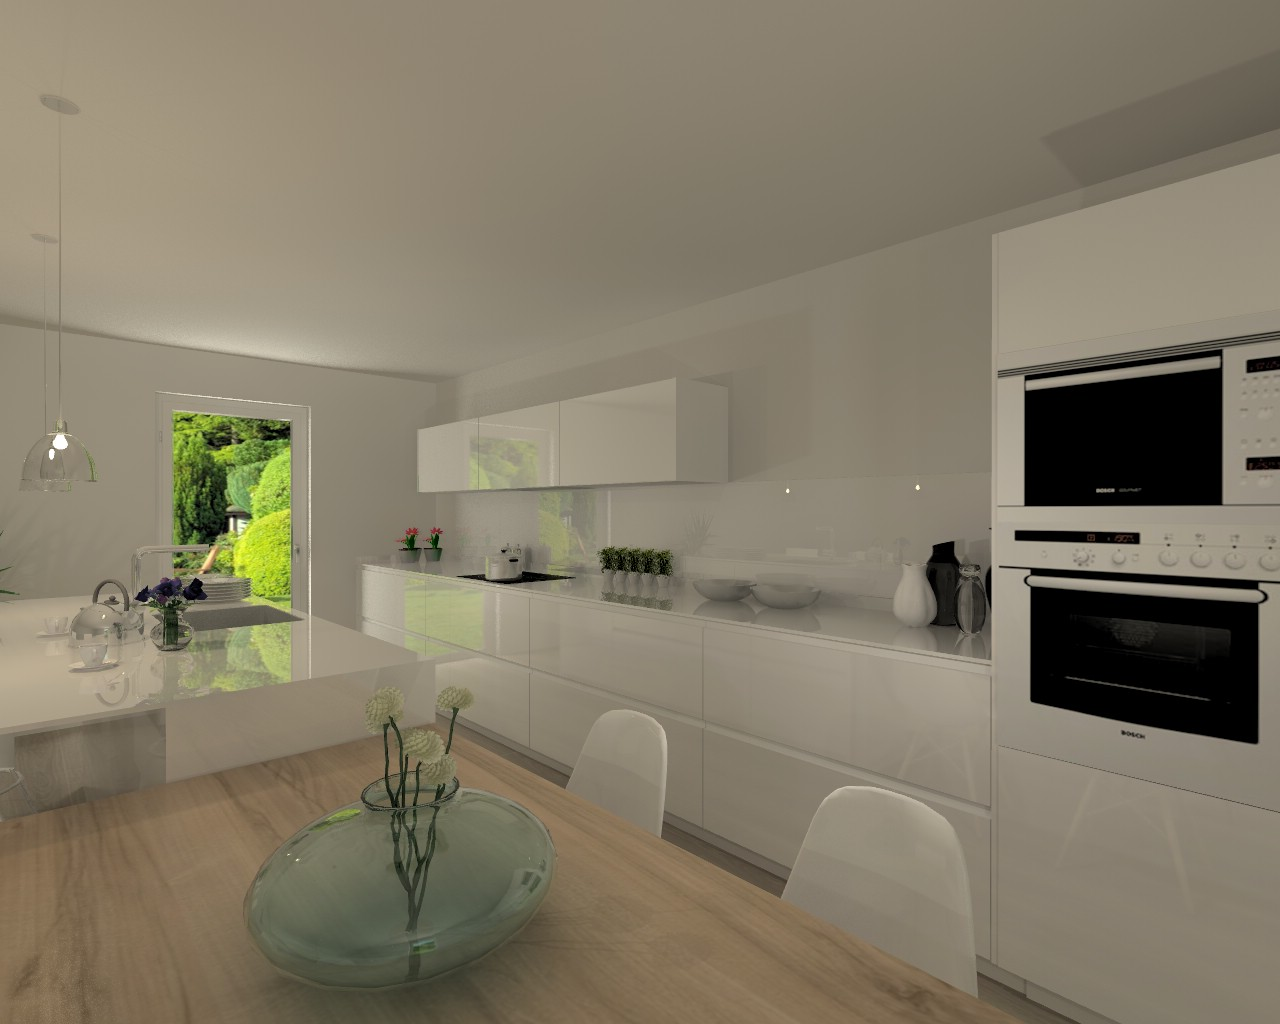 Proyecto cocina santos modelo line con encimera silestone for Proyecto cocina